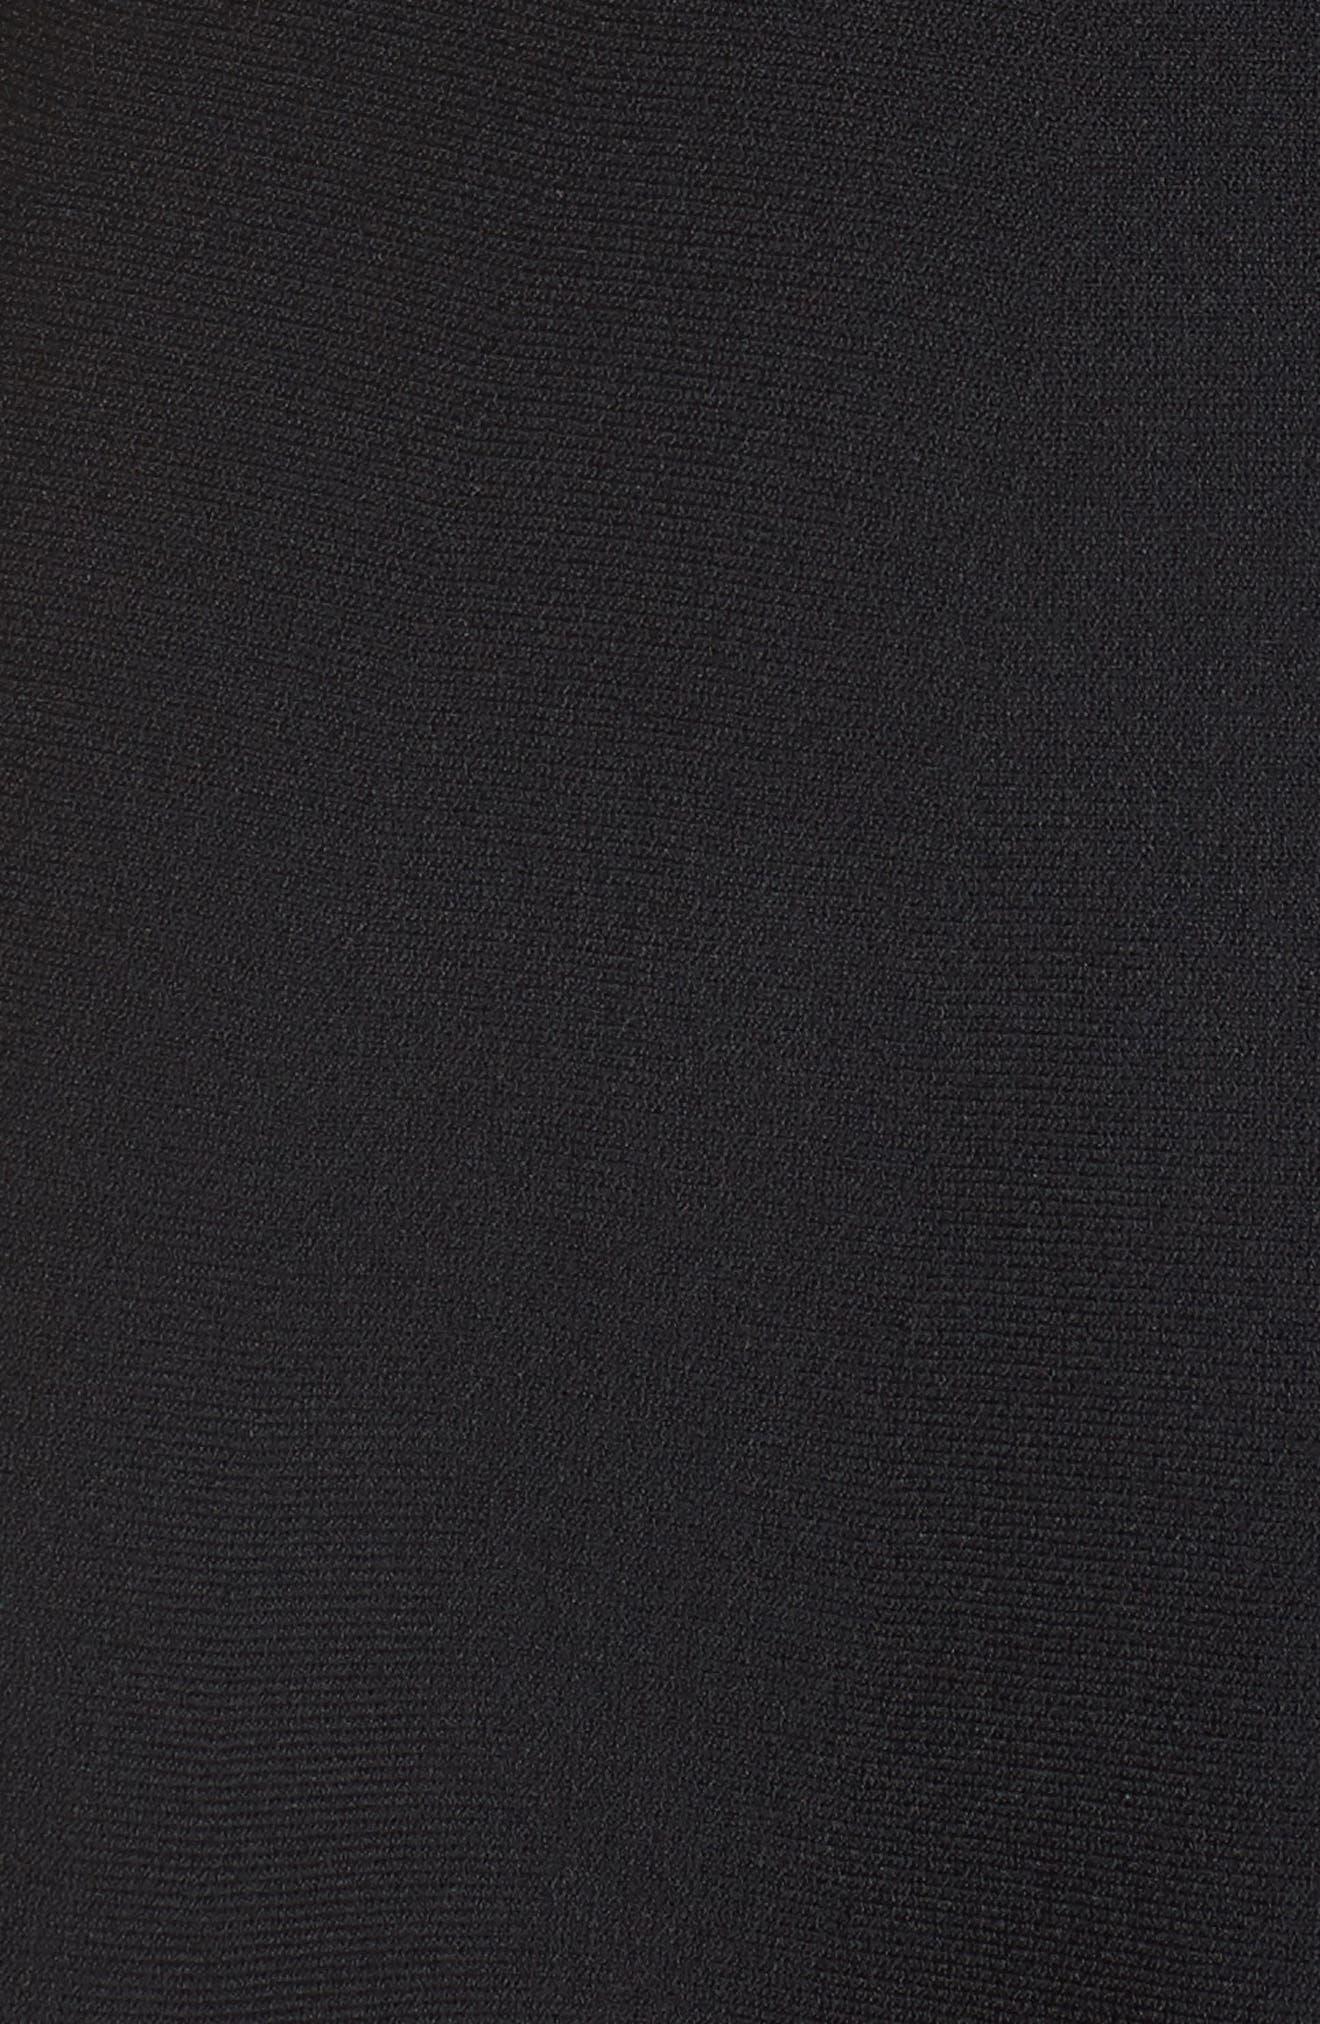 ELIZA J, Contrast Stripe Fit & Flare Dress, Alternate thumbnail 6, color, 001